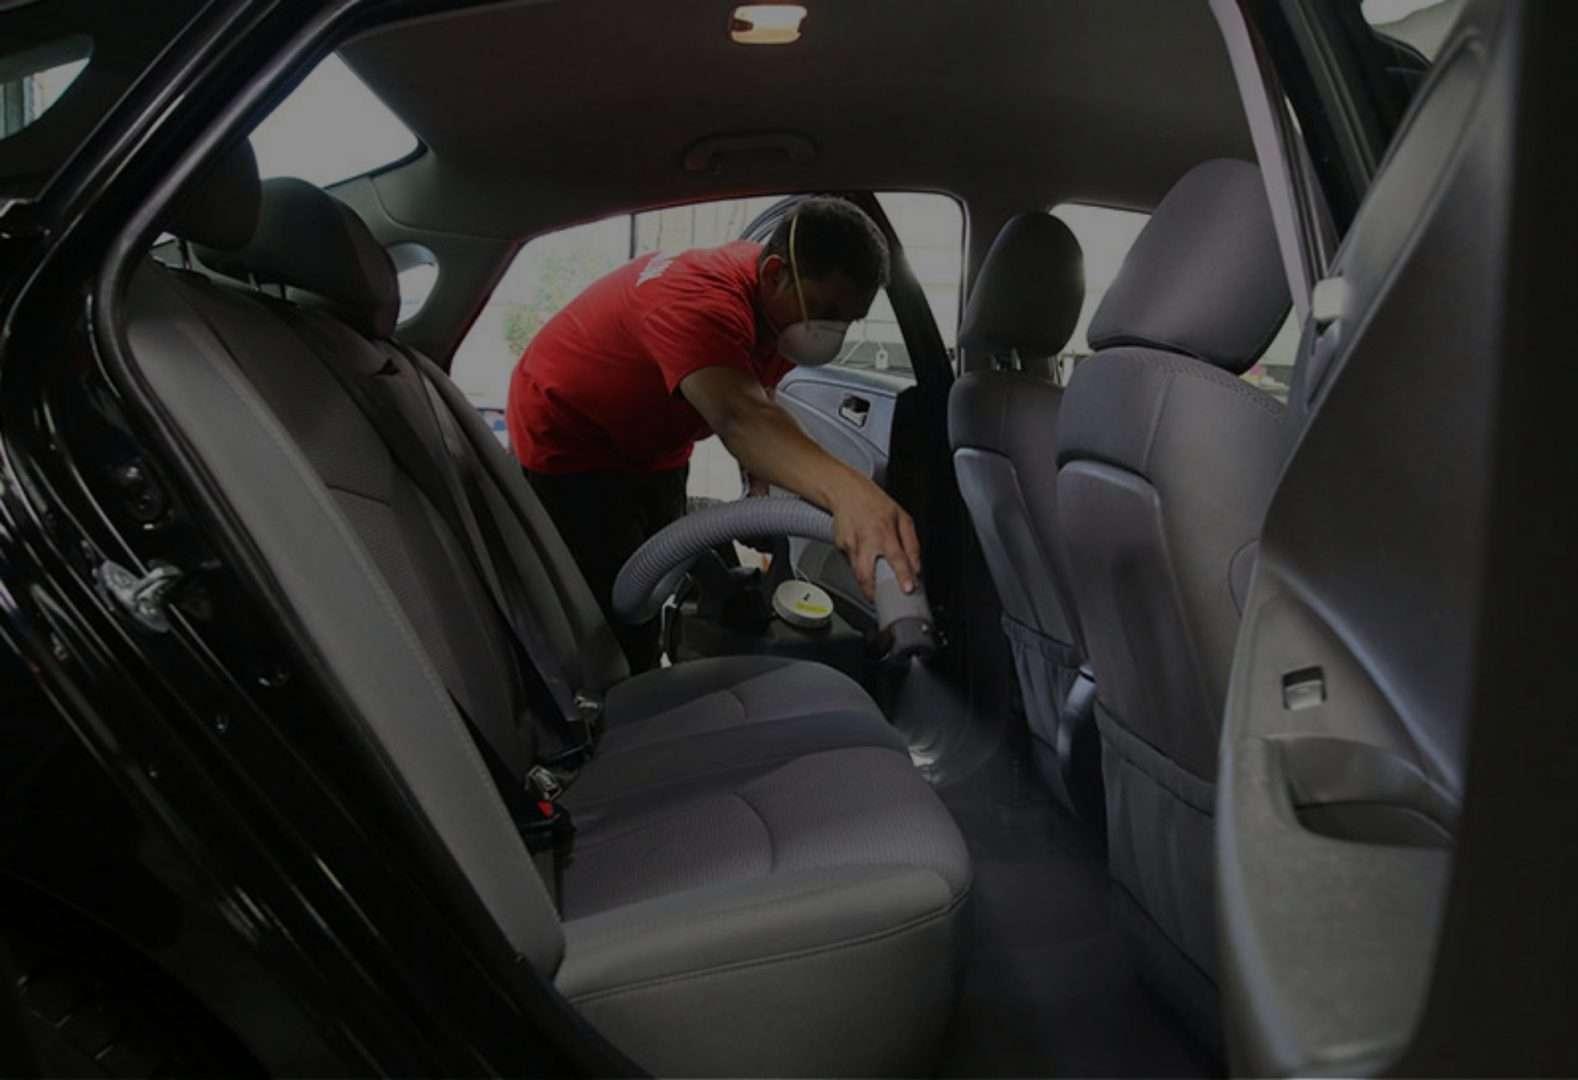 vehicle antibacterial treatment